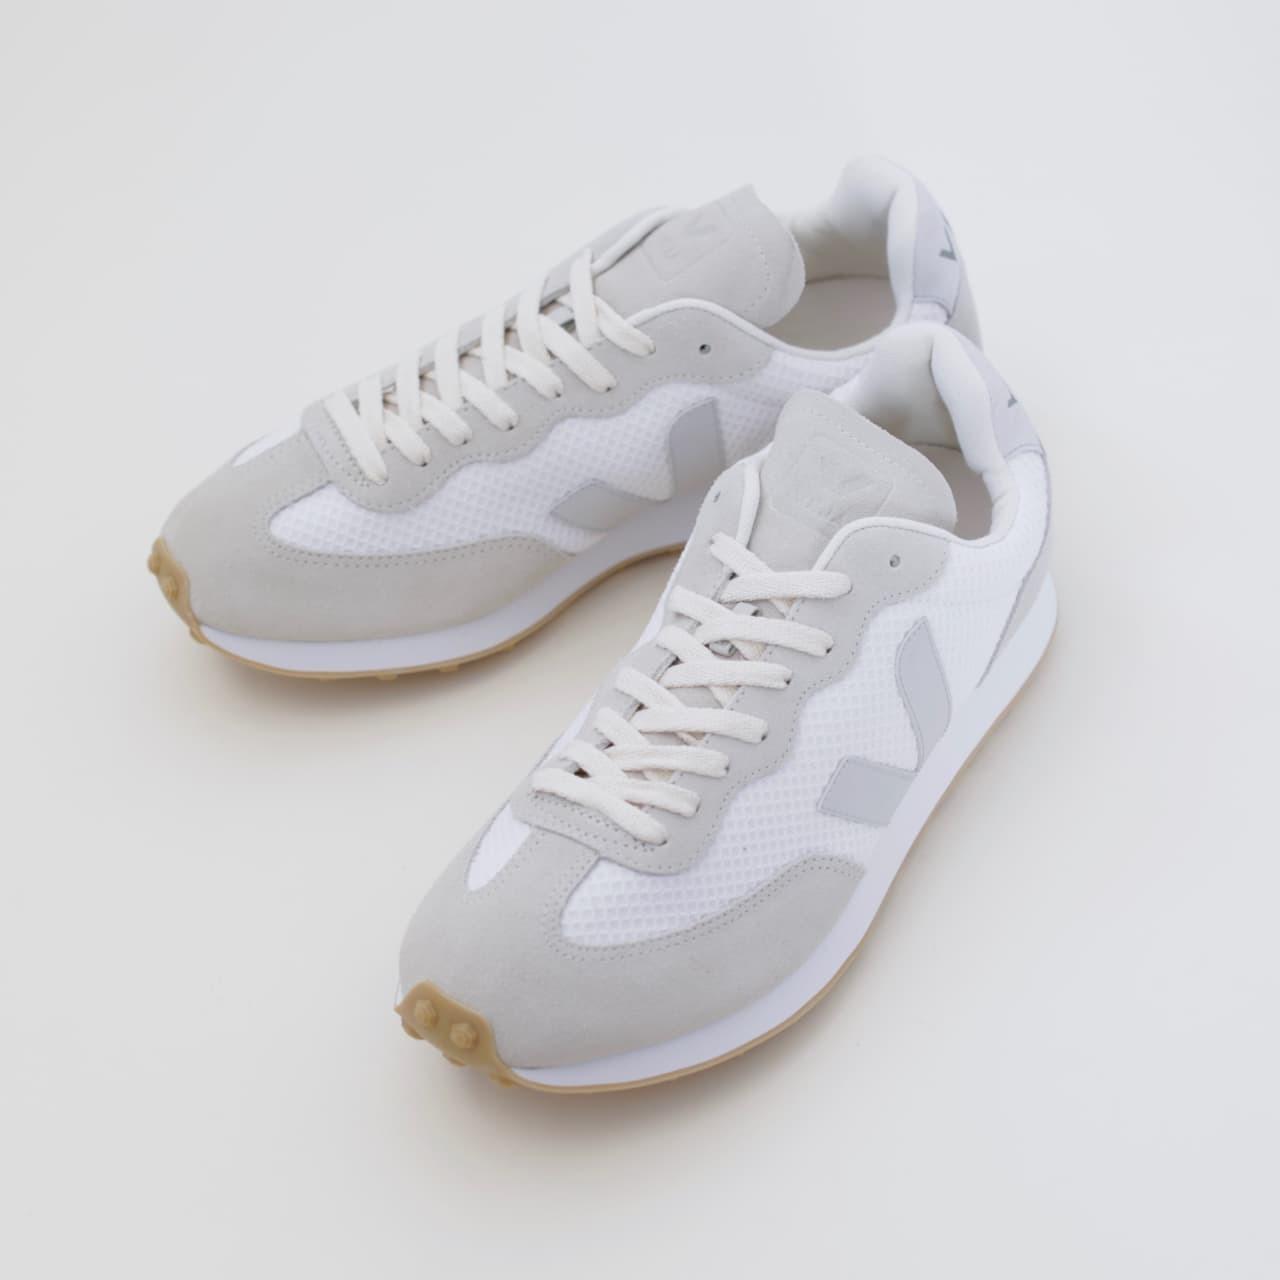 RIO BRANCO veja-sneakers-ladys-style-rio-branco